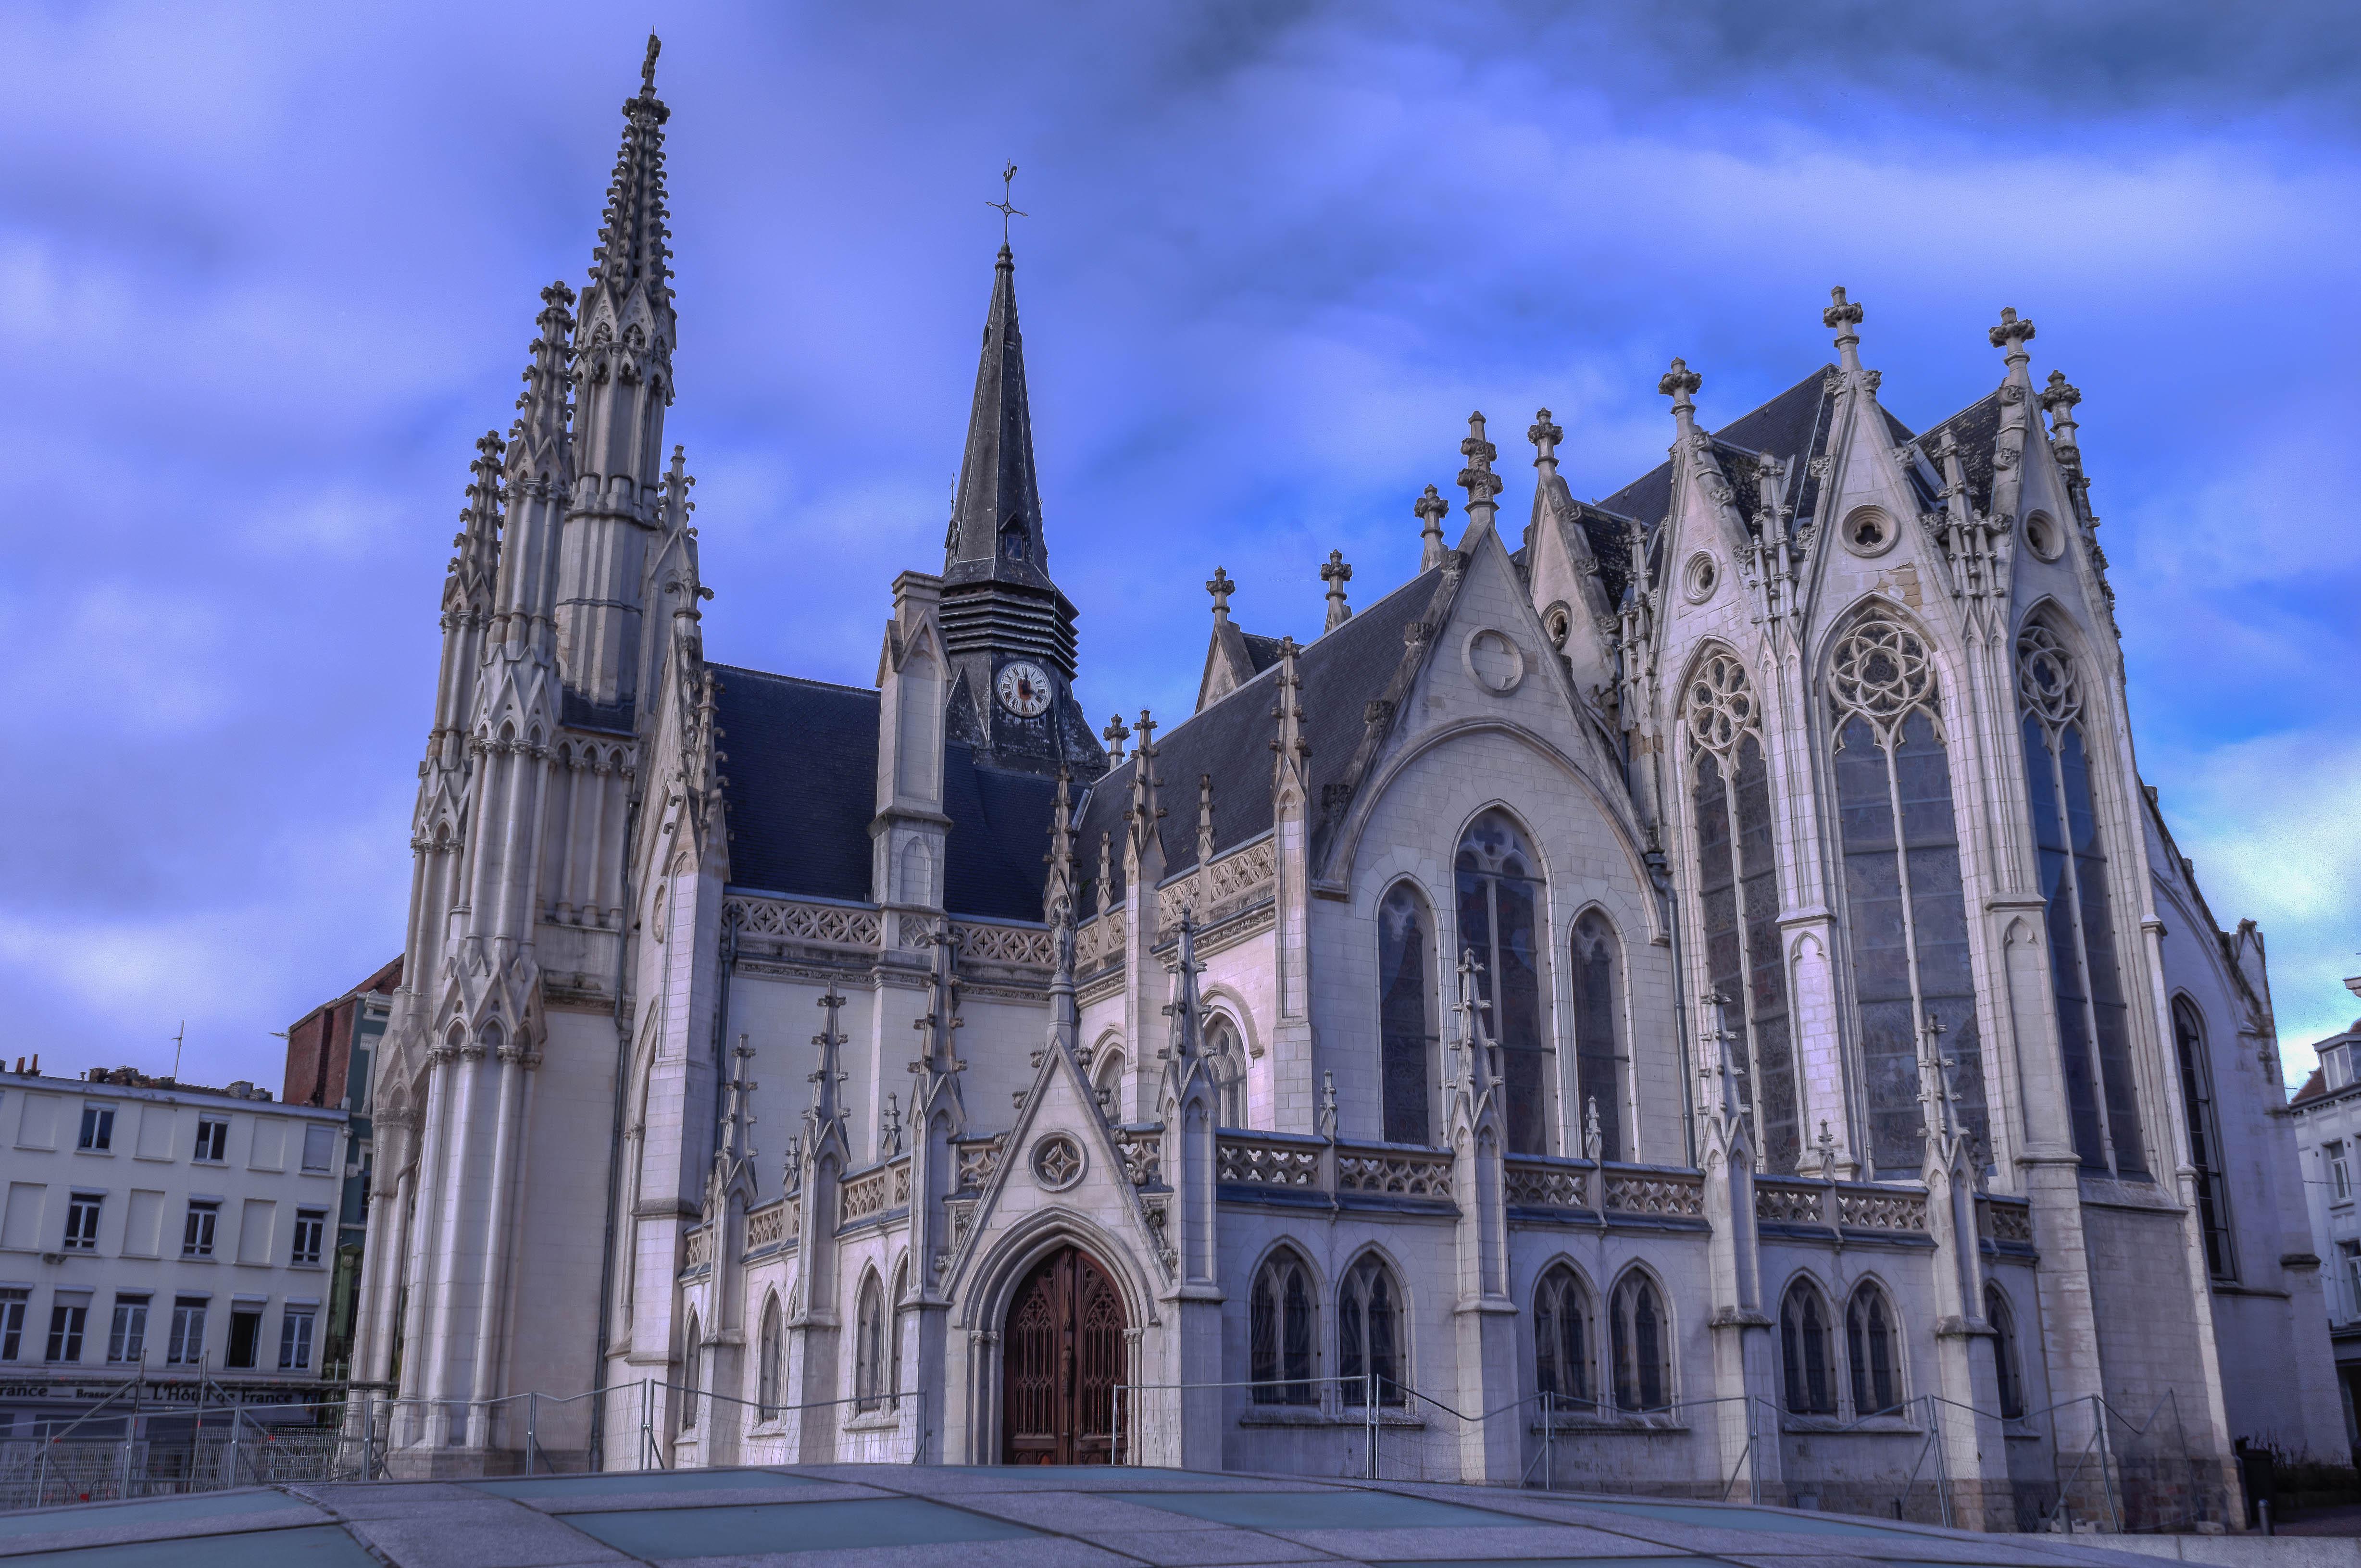 Eglise saint martin roubaix photo